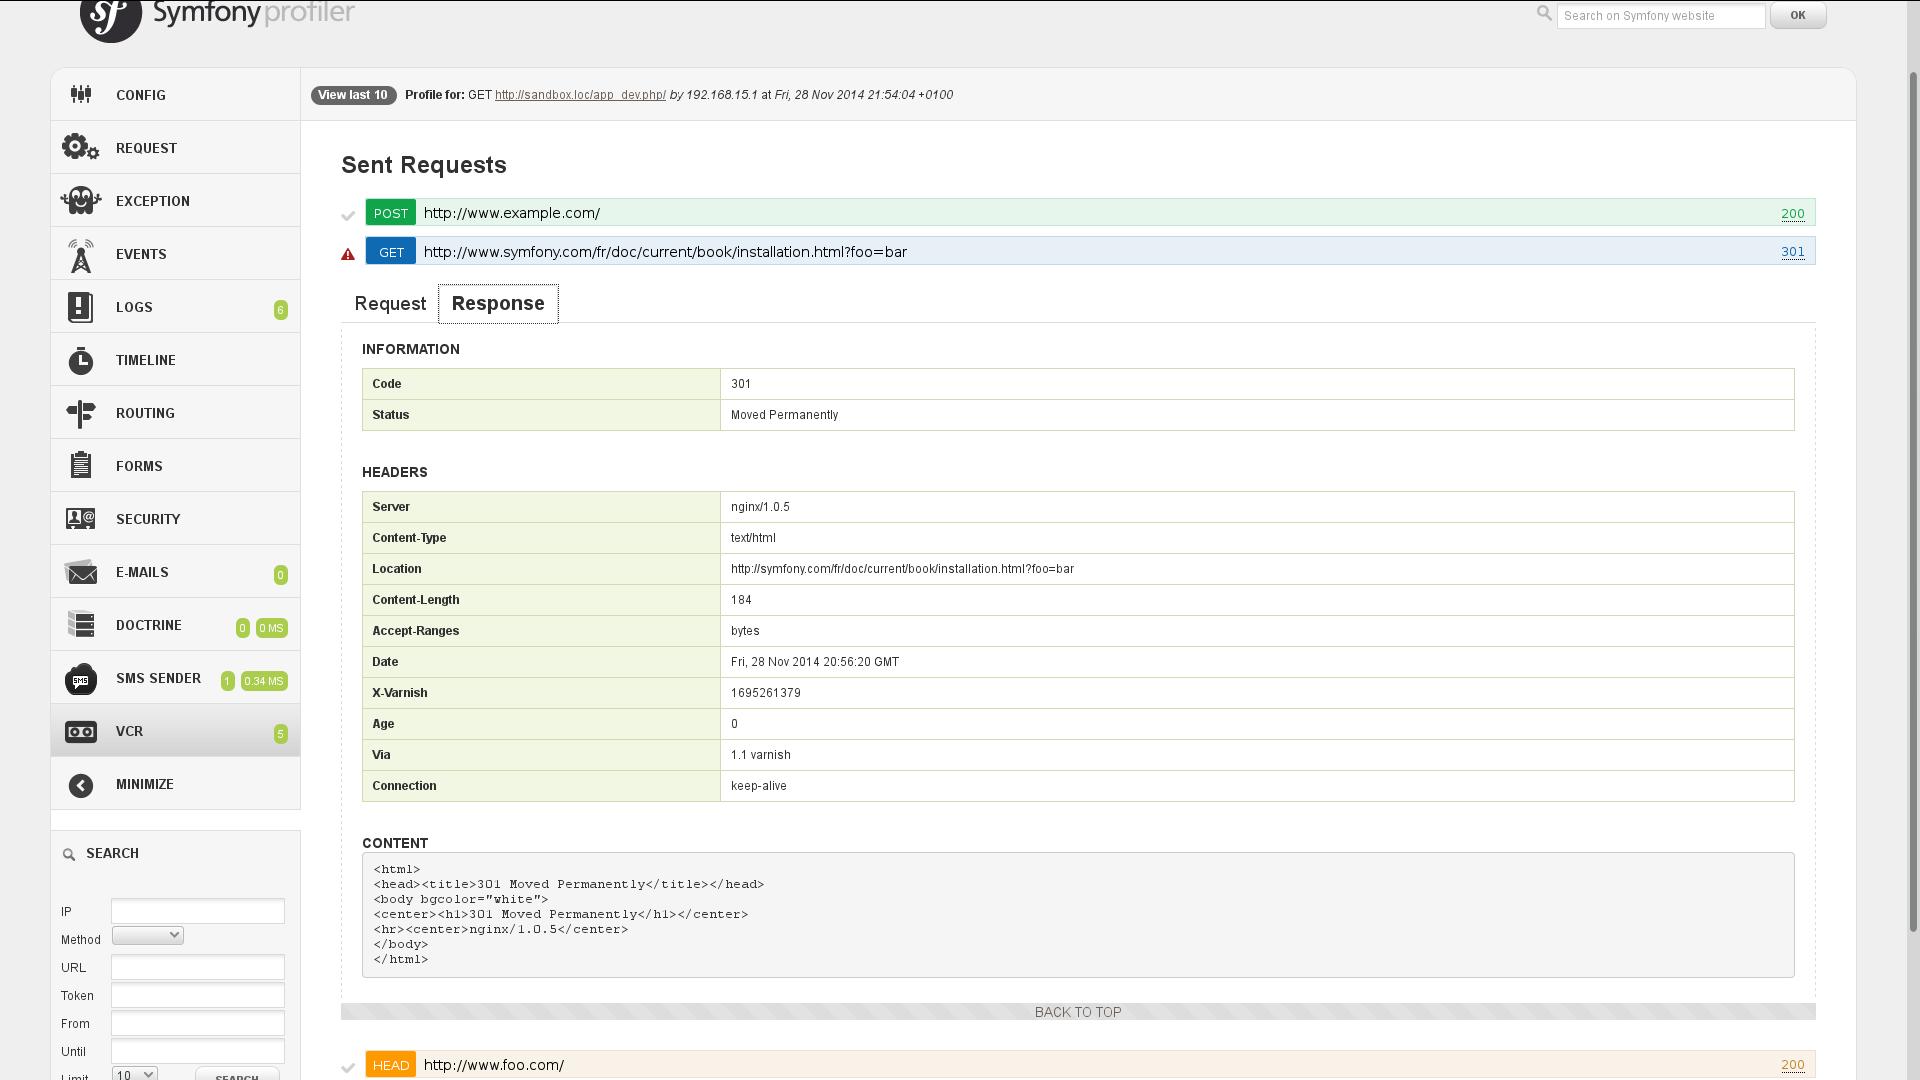 PHP-VCR Symfony web profiler panel - response details